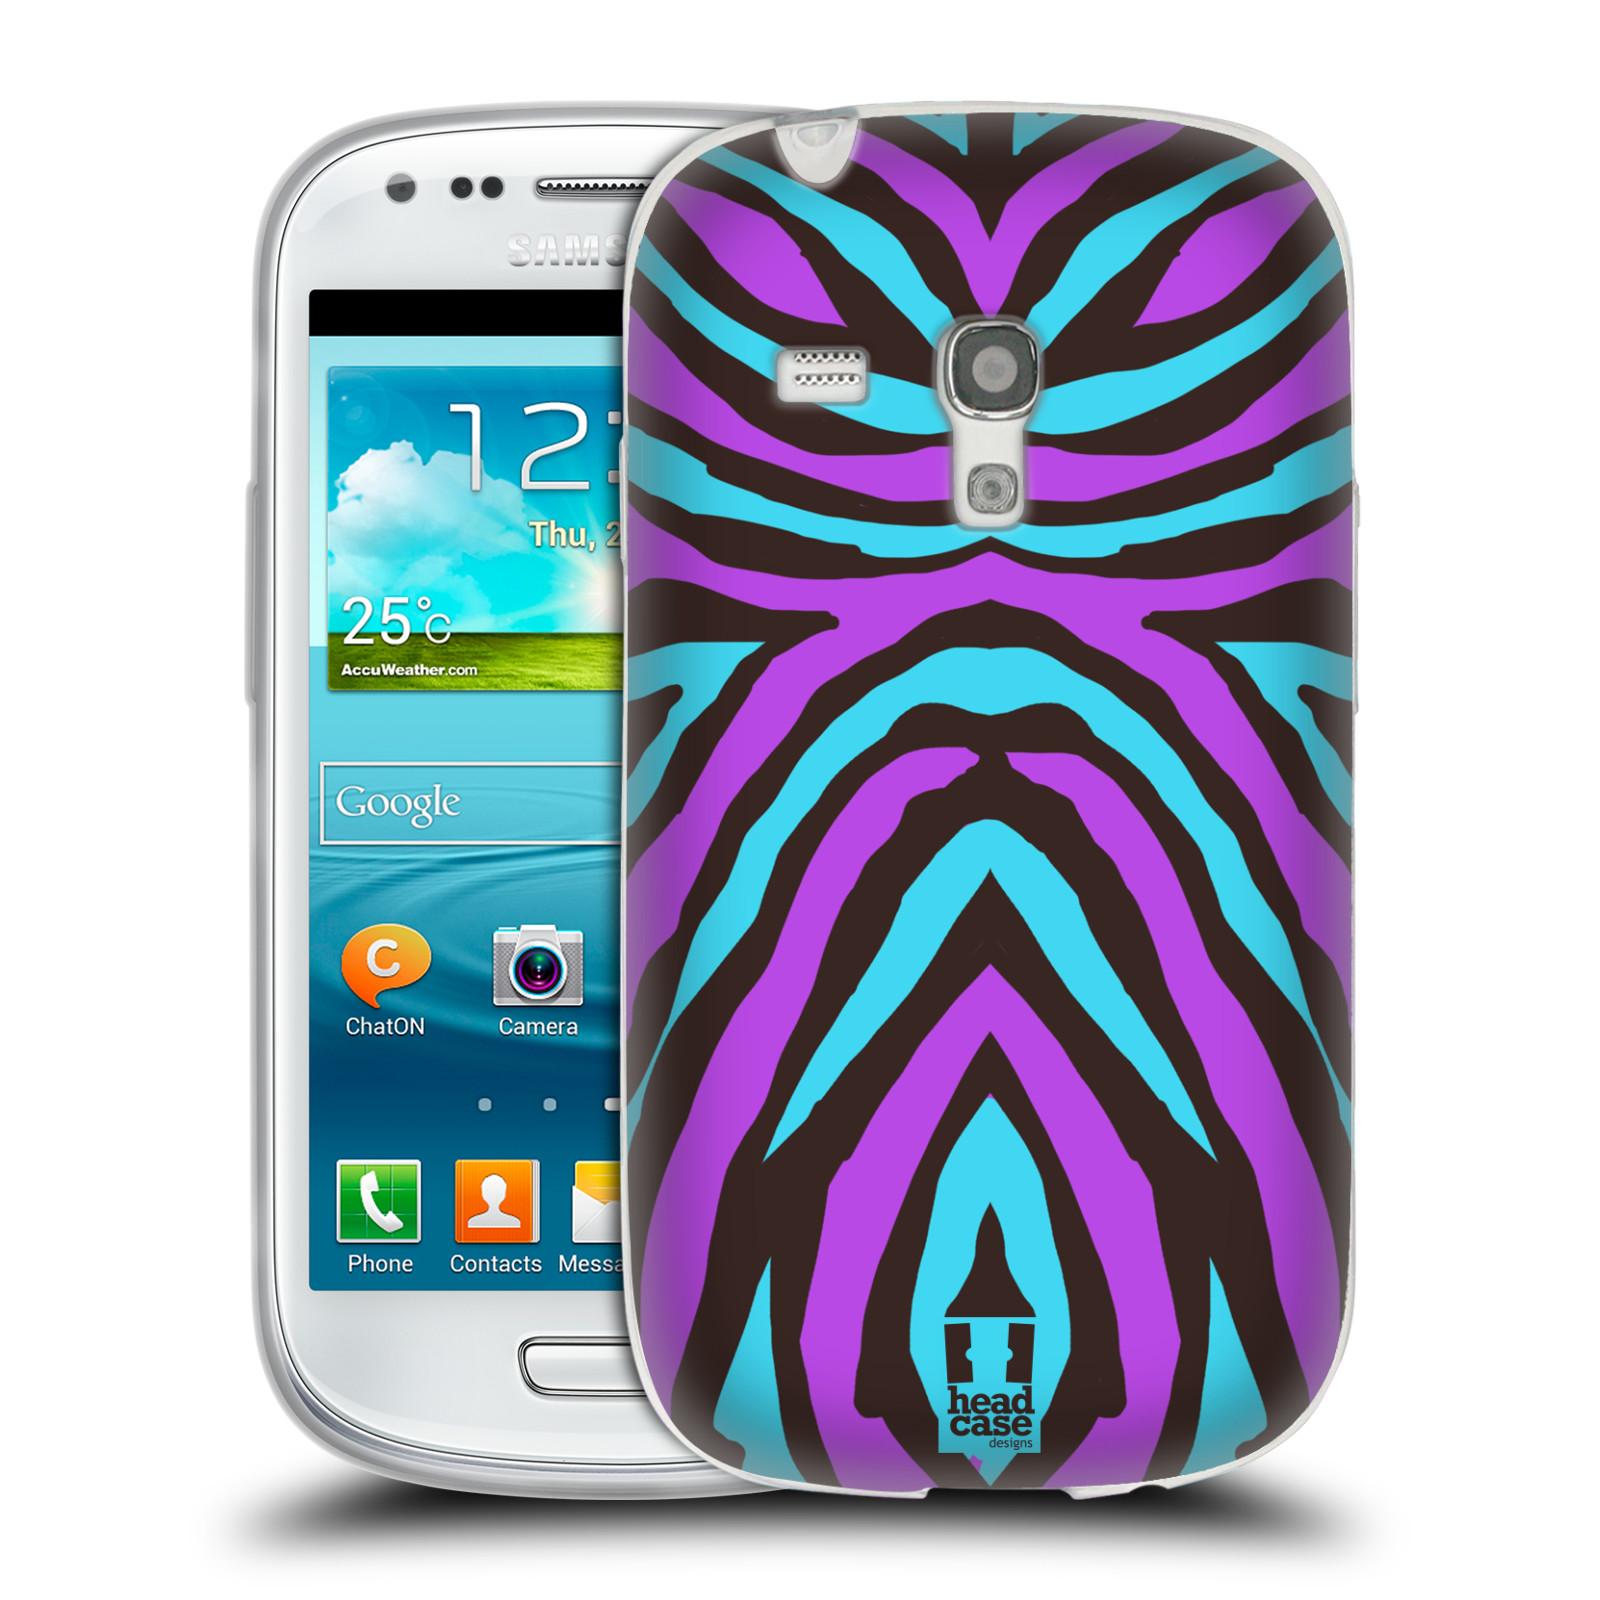 HEAD CASE silikonový obal na mobil Samsung Galaxy S3 MINI i8190 vzor Divočina zvíře 2 bláznivé pruhy fialová a modrá